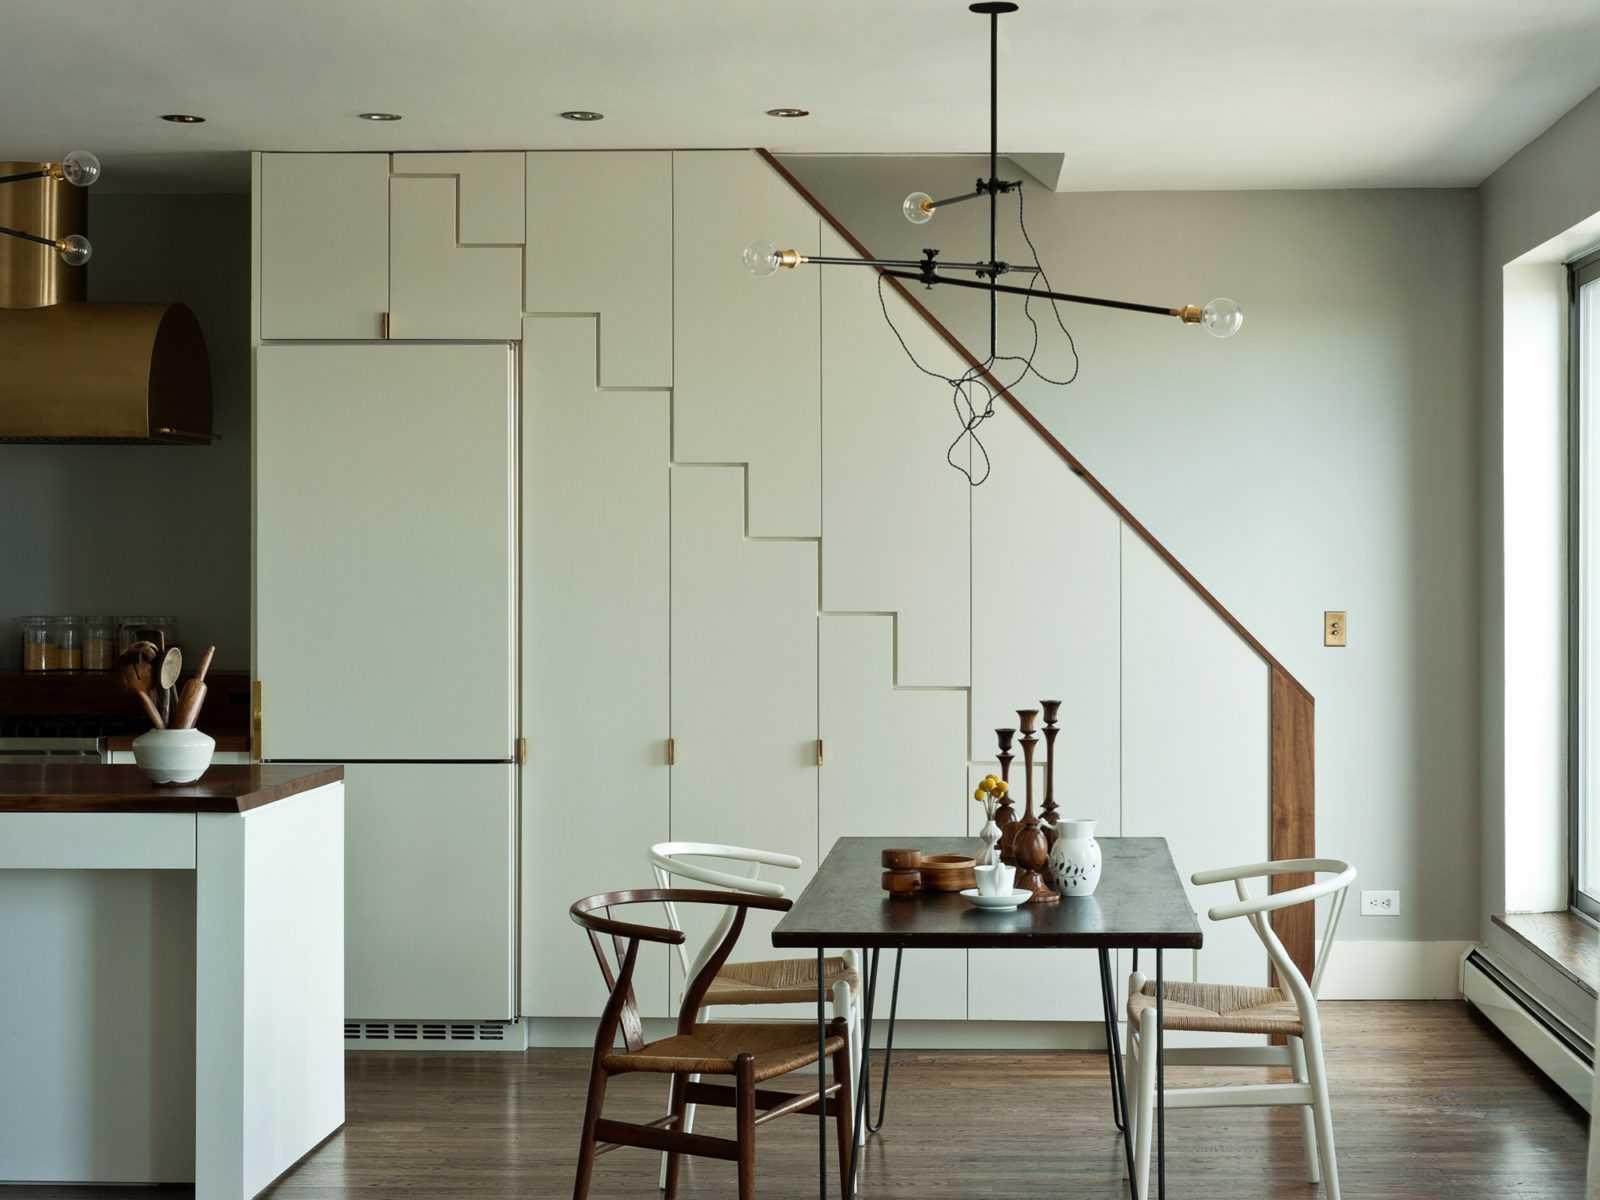 Установка холодильника под лестницей